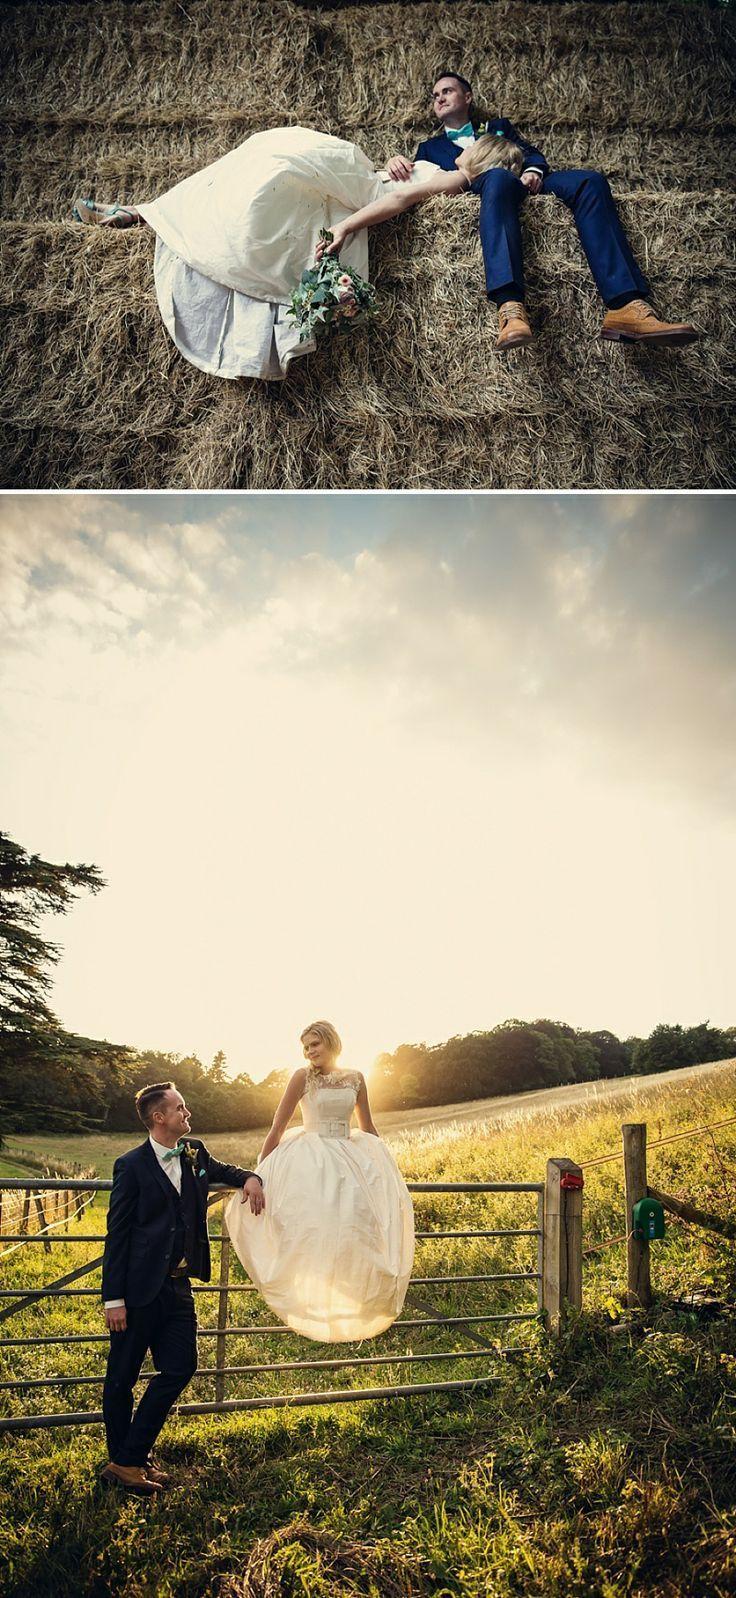 Rustic farm wedding, 2nd photo = perfect light.